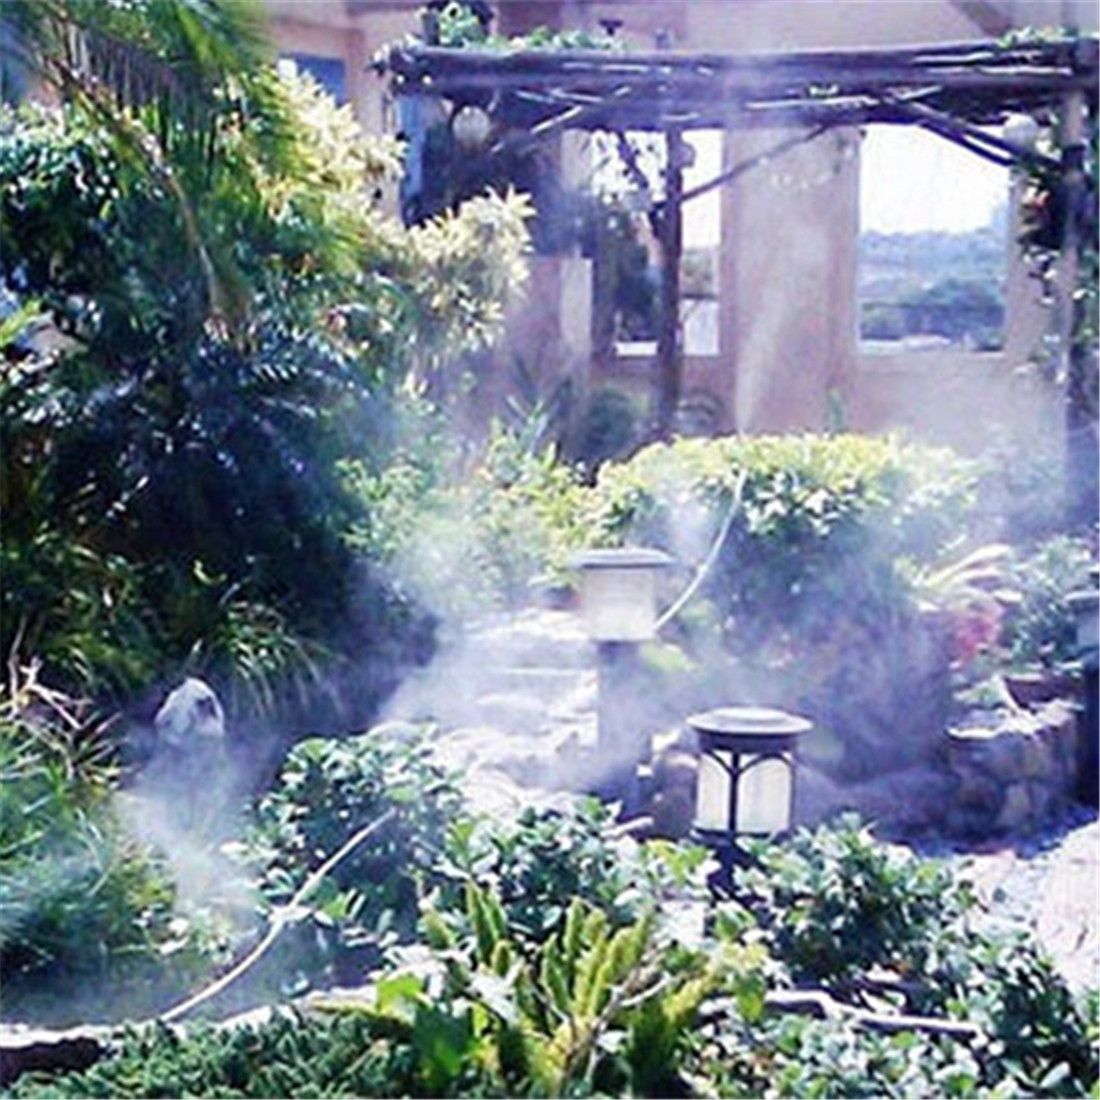 Garden Misting System : M outdoor garden misting cooling system plastic mist